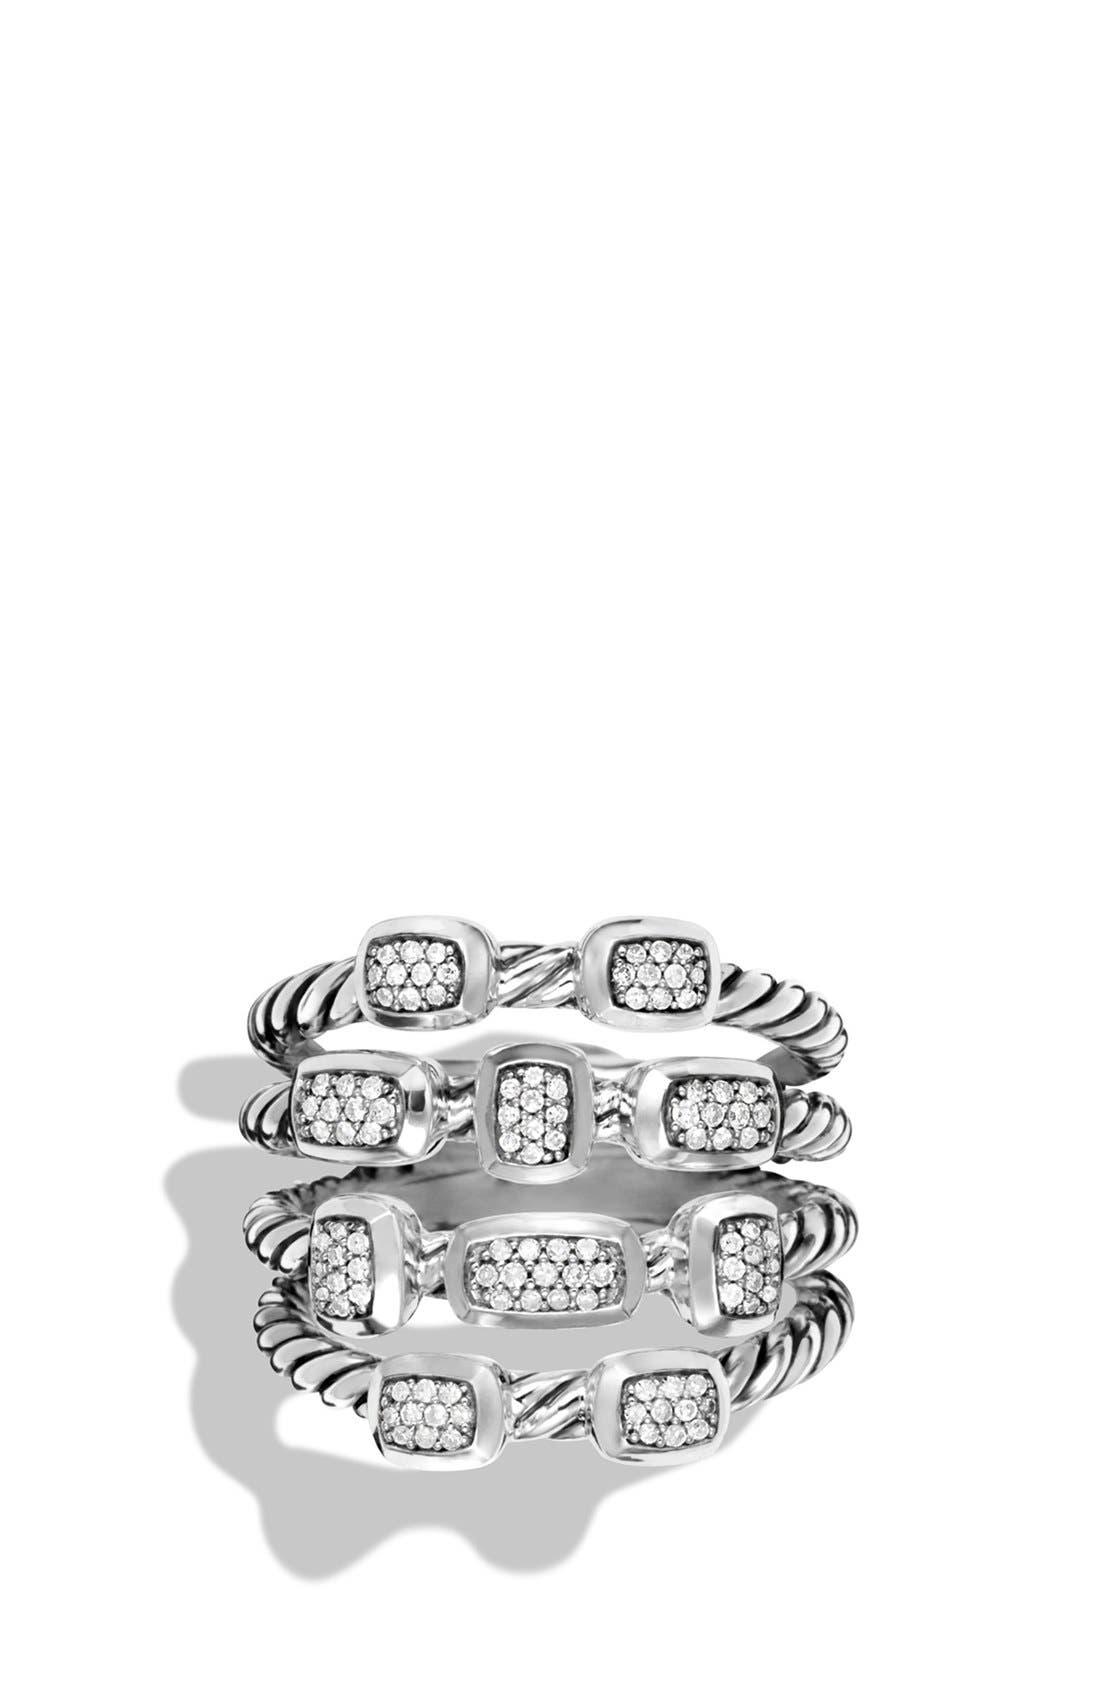 'Confetti' Ring with Diamonds,                             Main thumbnail 1, color,                             DIAMOND